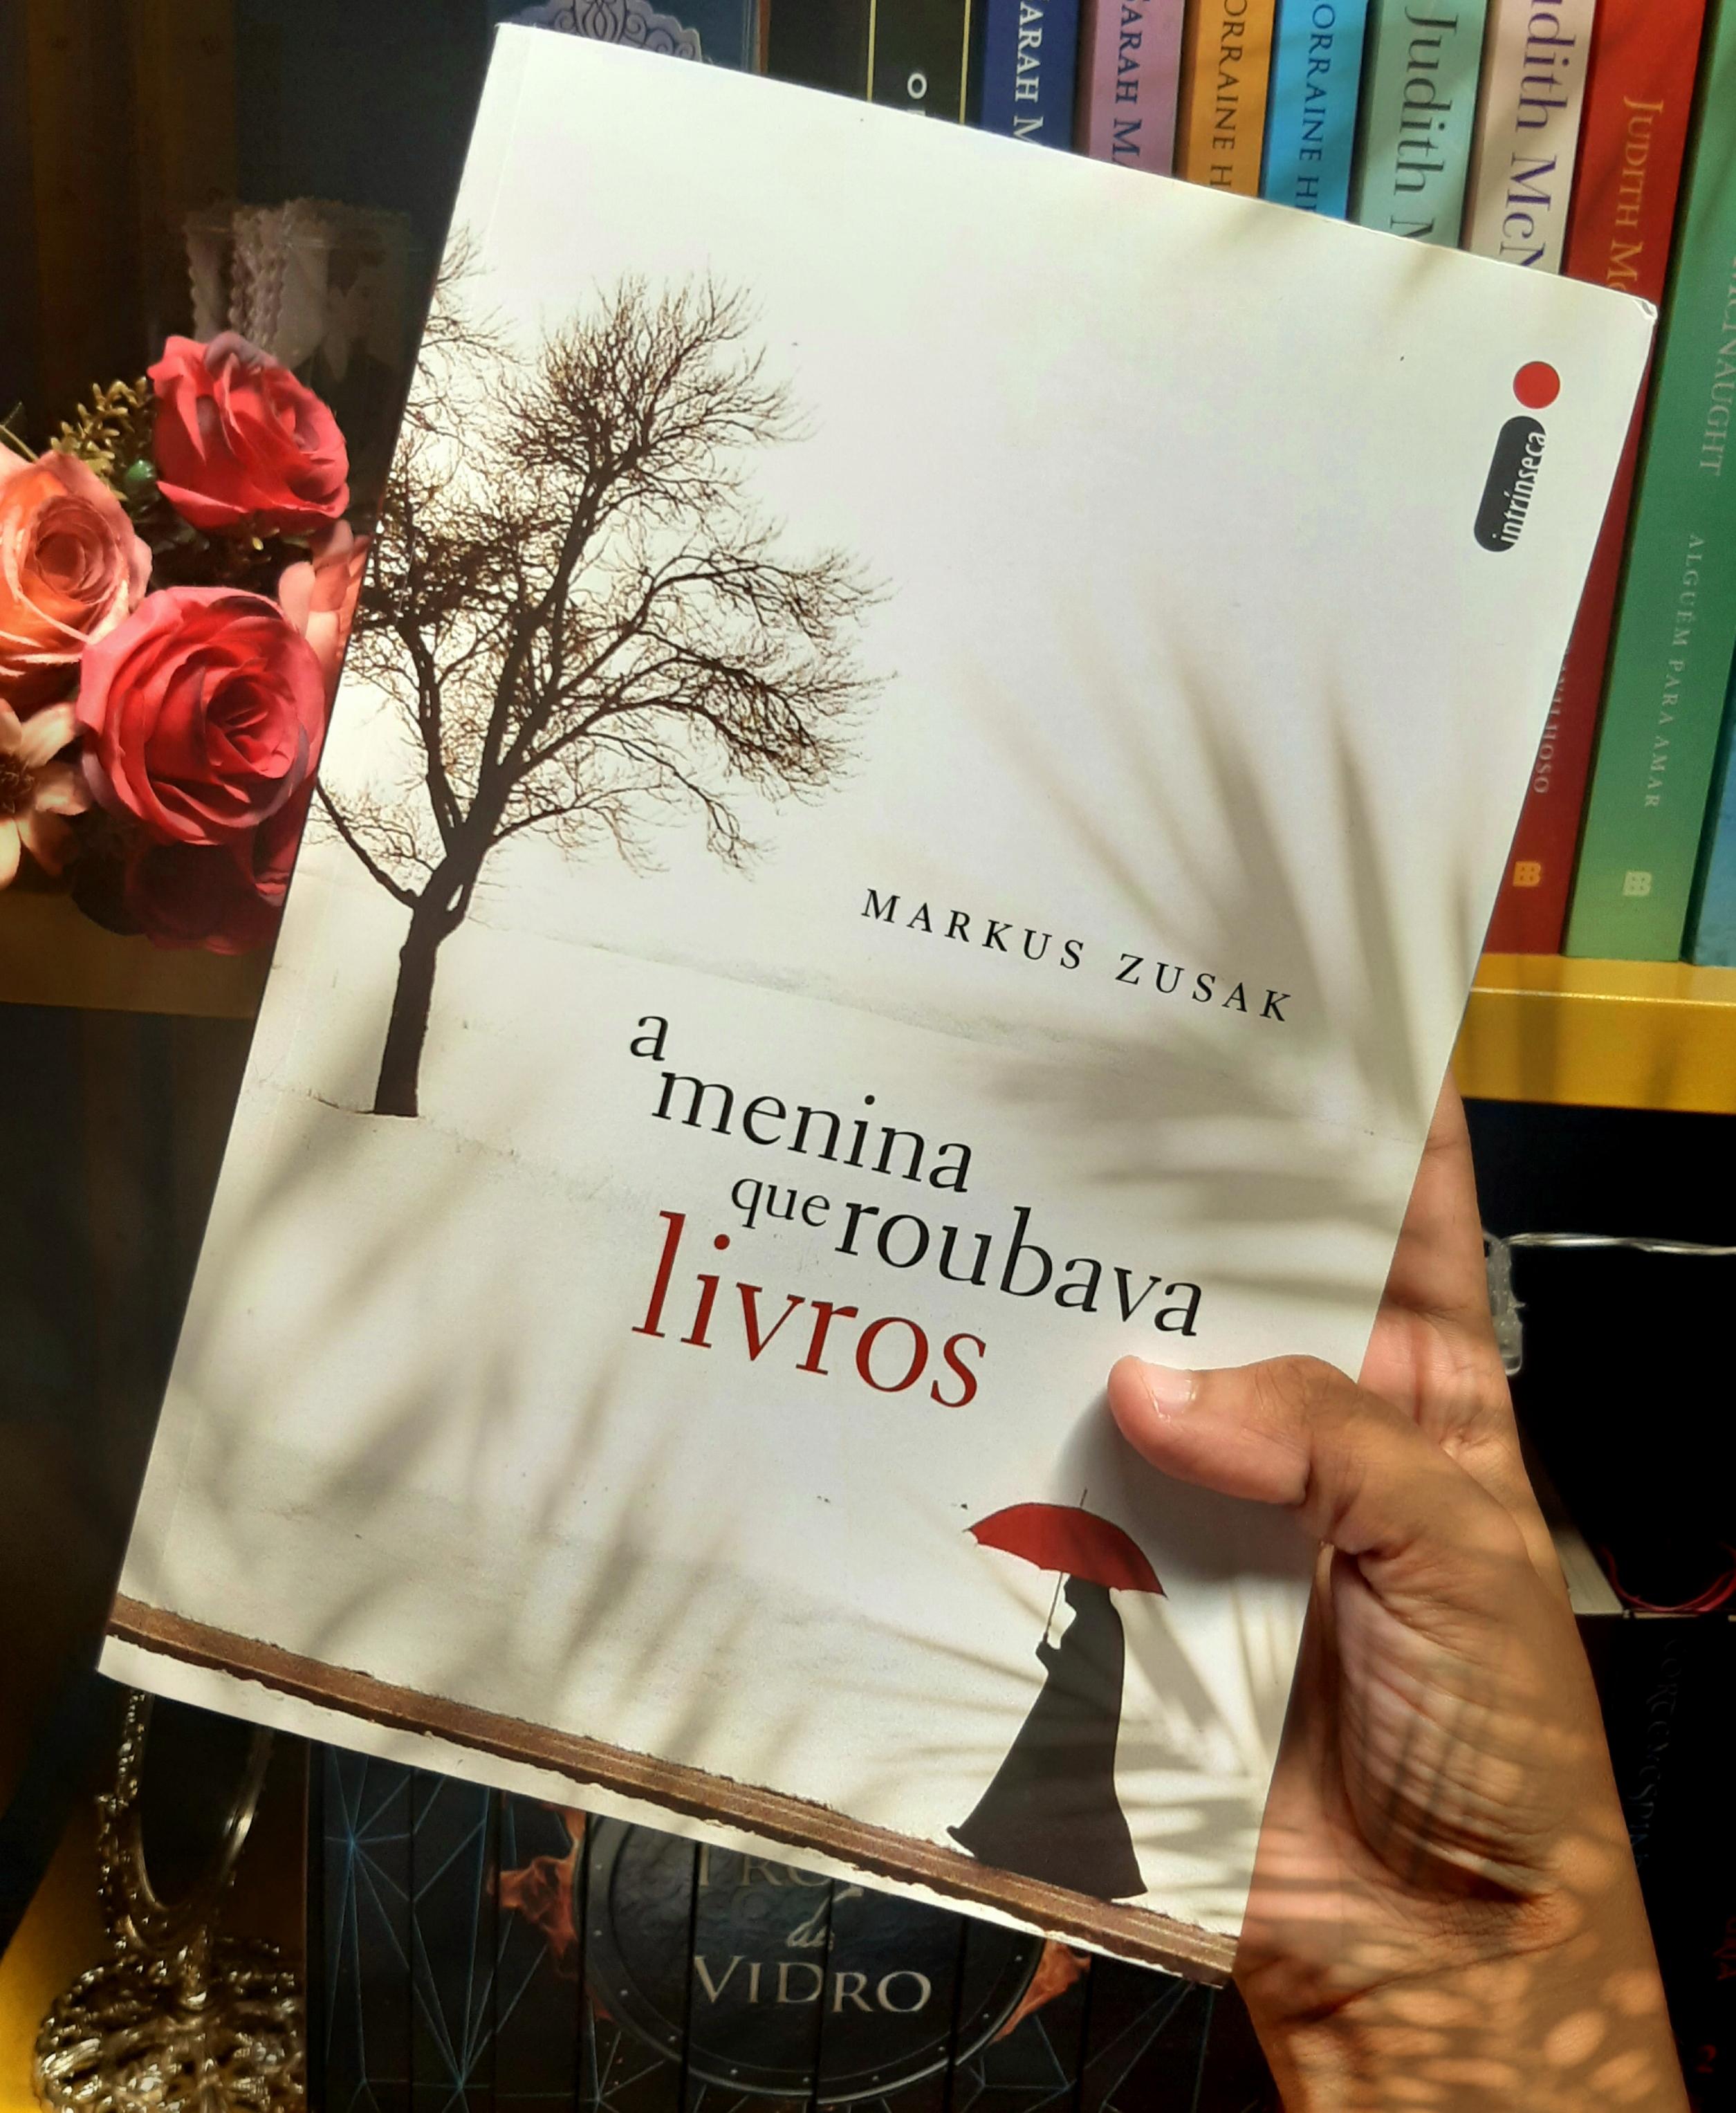 Liesel Meminger, Beleza de Livros, Markus Zusak, Editora Intríseca, belezadelivros.com, Eu Leio, A menina que roubava Livros